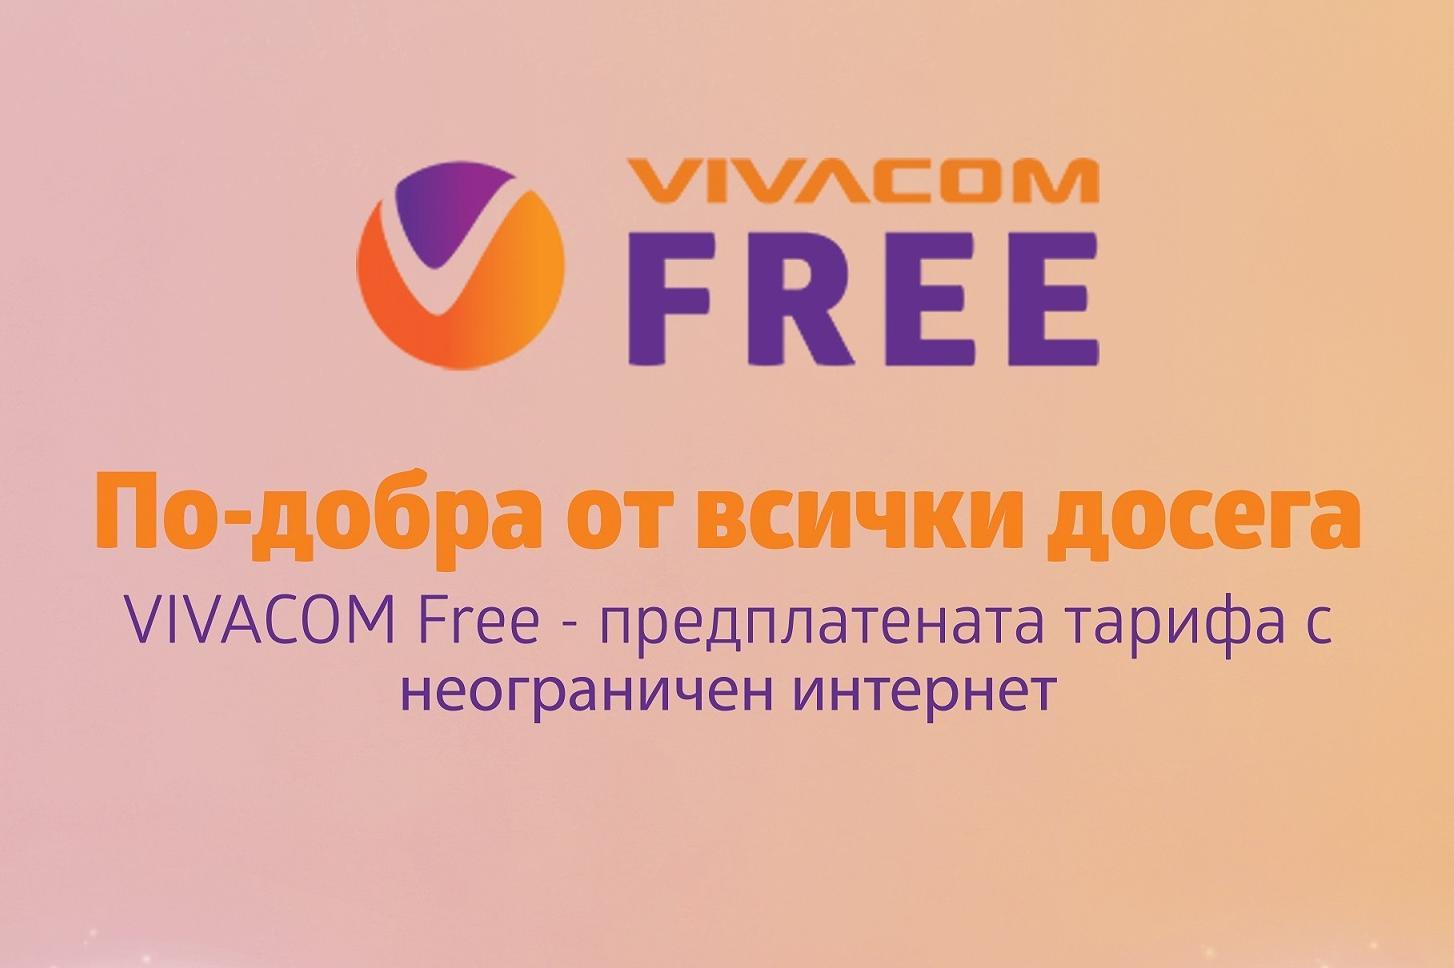 VIVACOM FREE